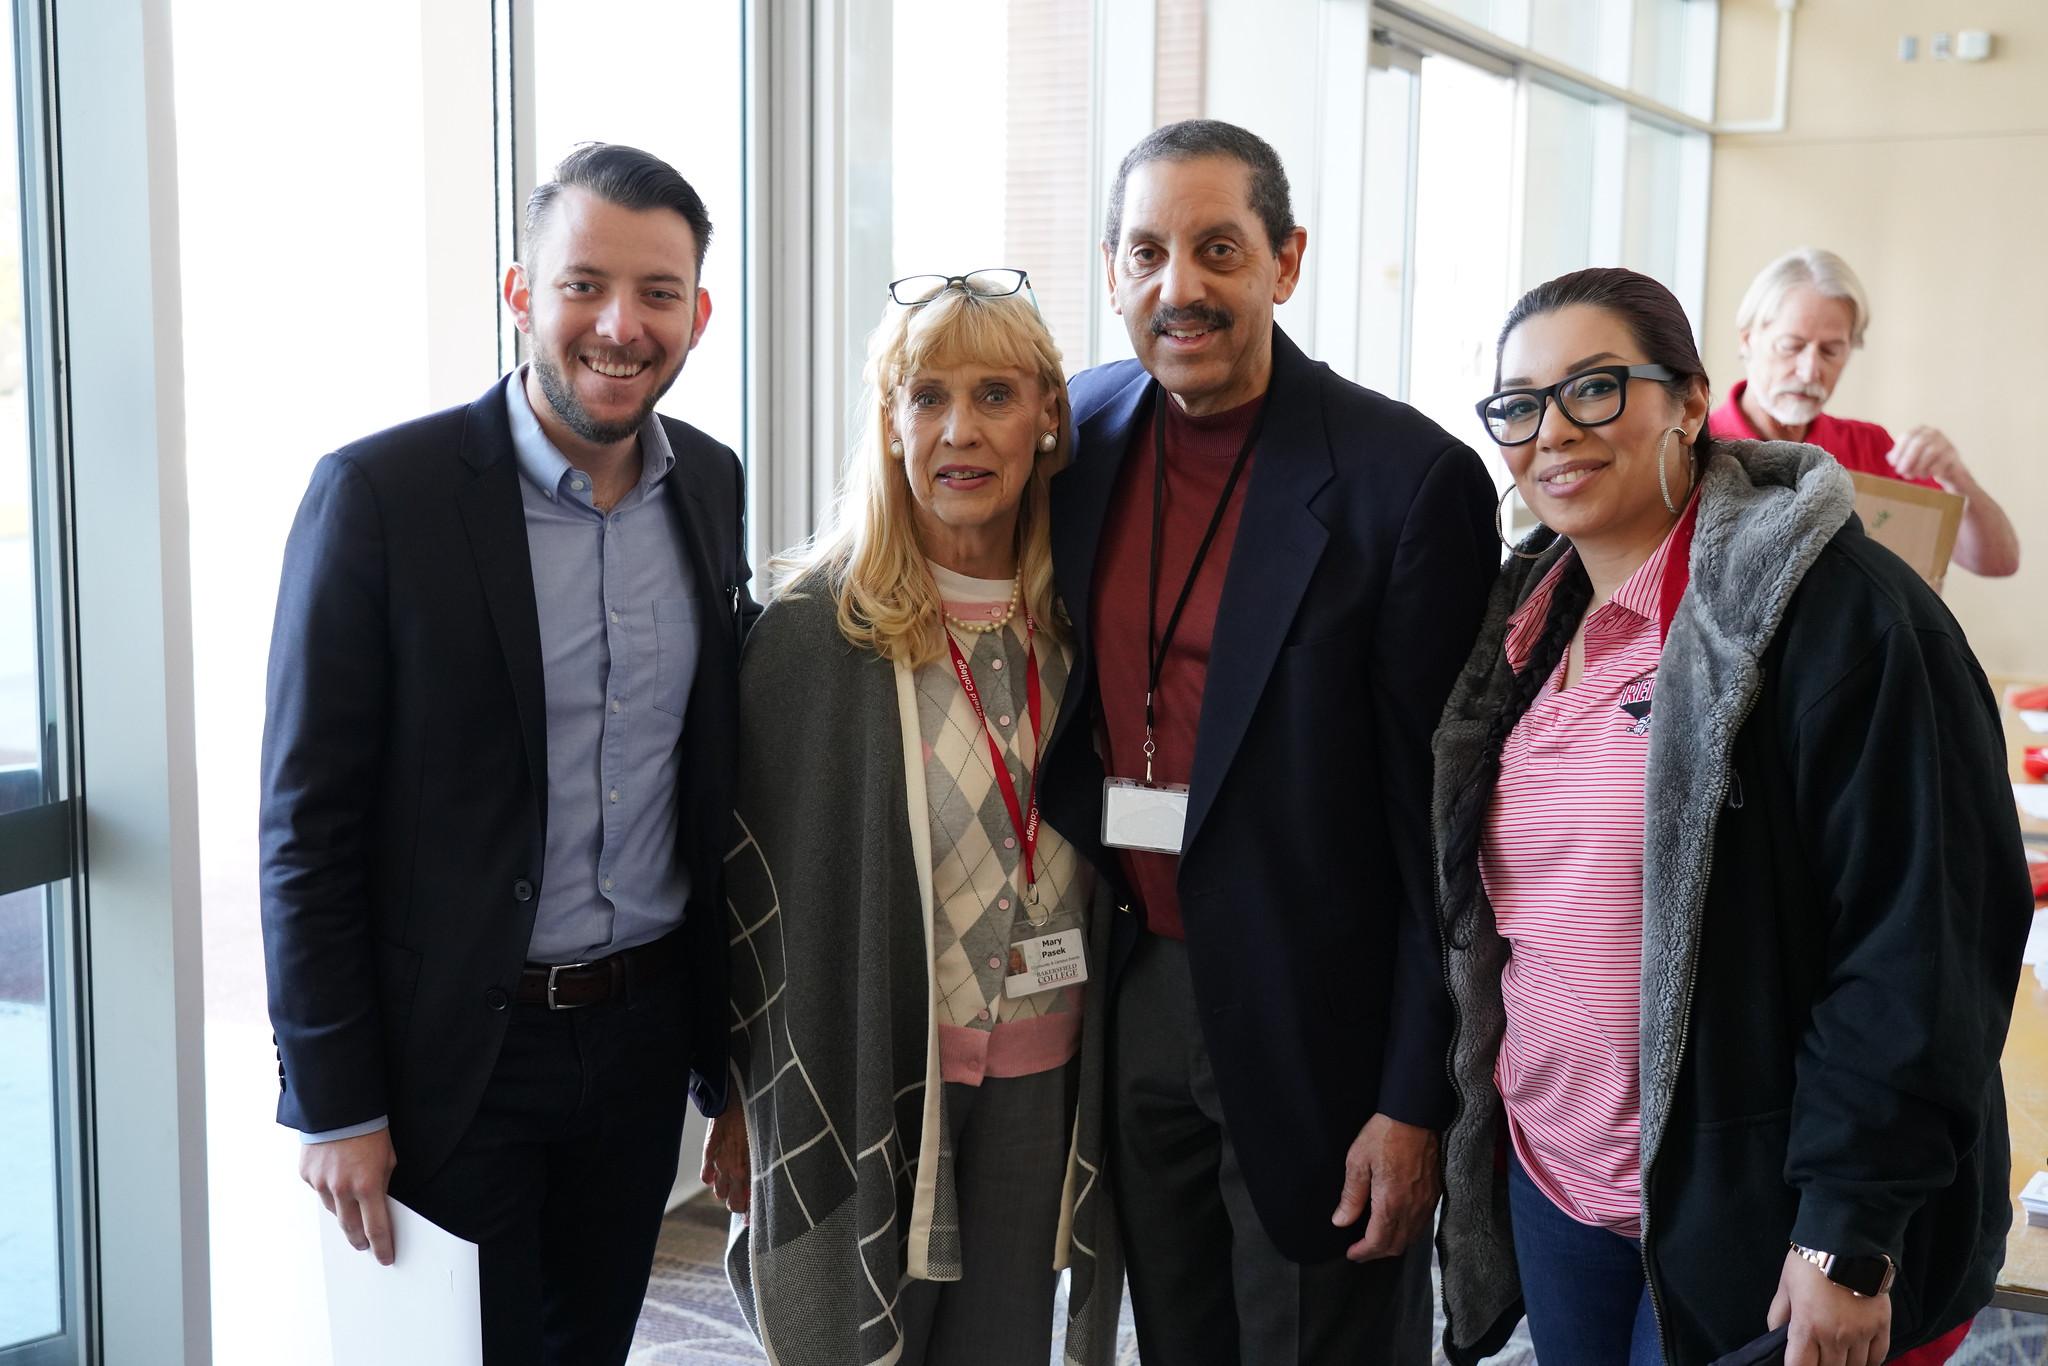 Tanner Dyrness, Mary Jo Pasek, Michael McClenic